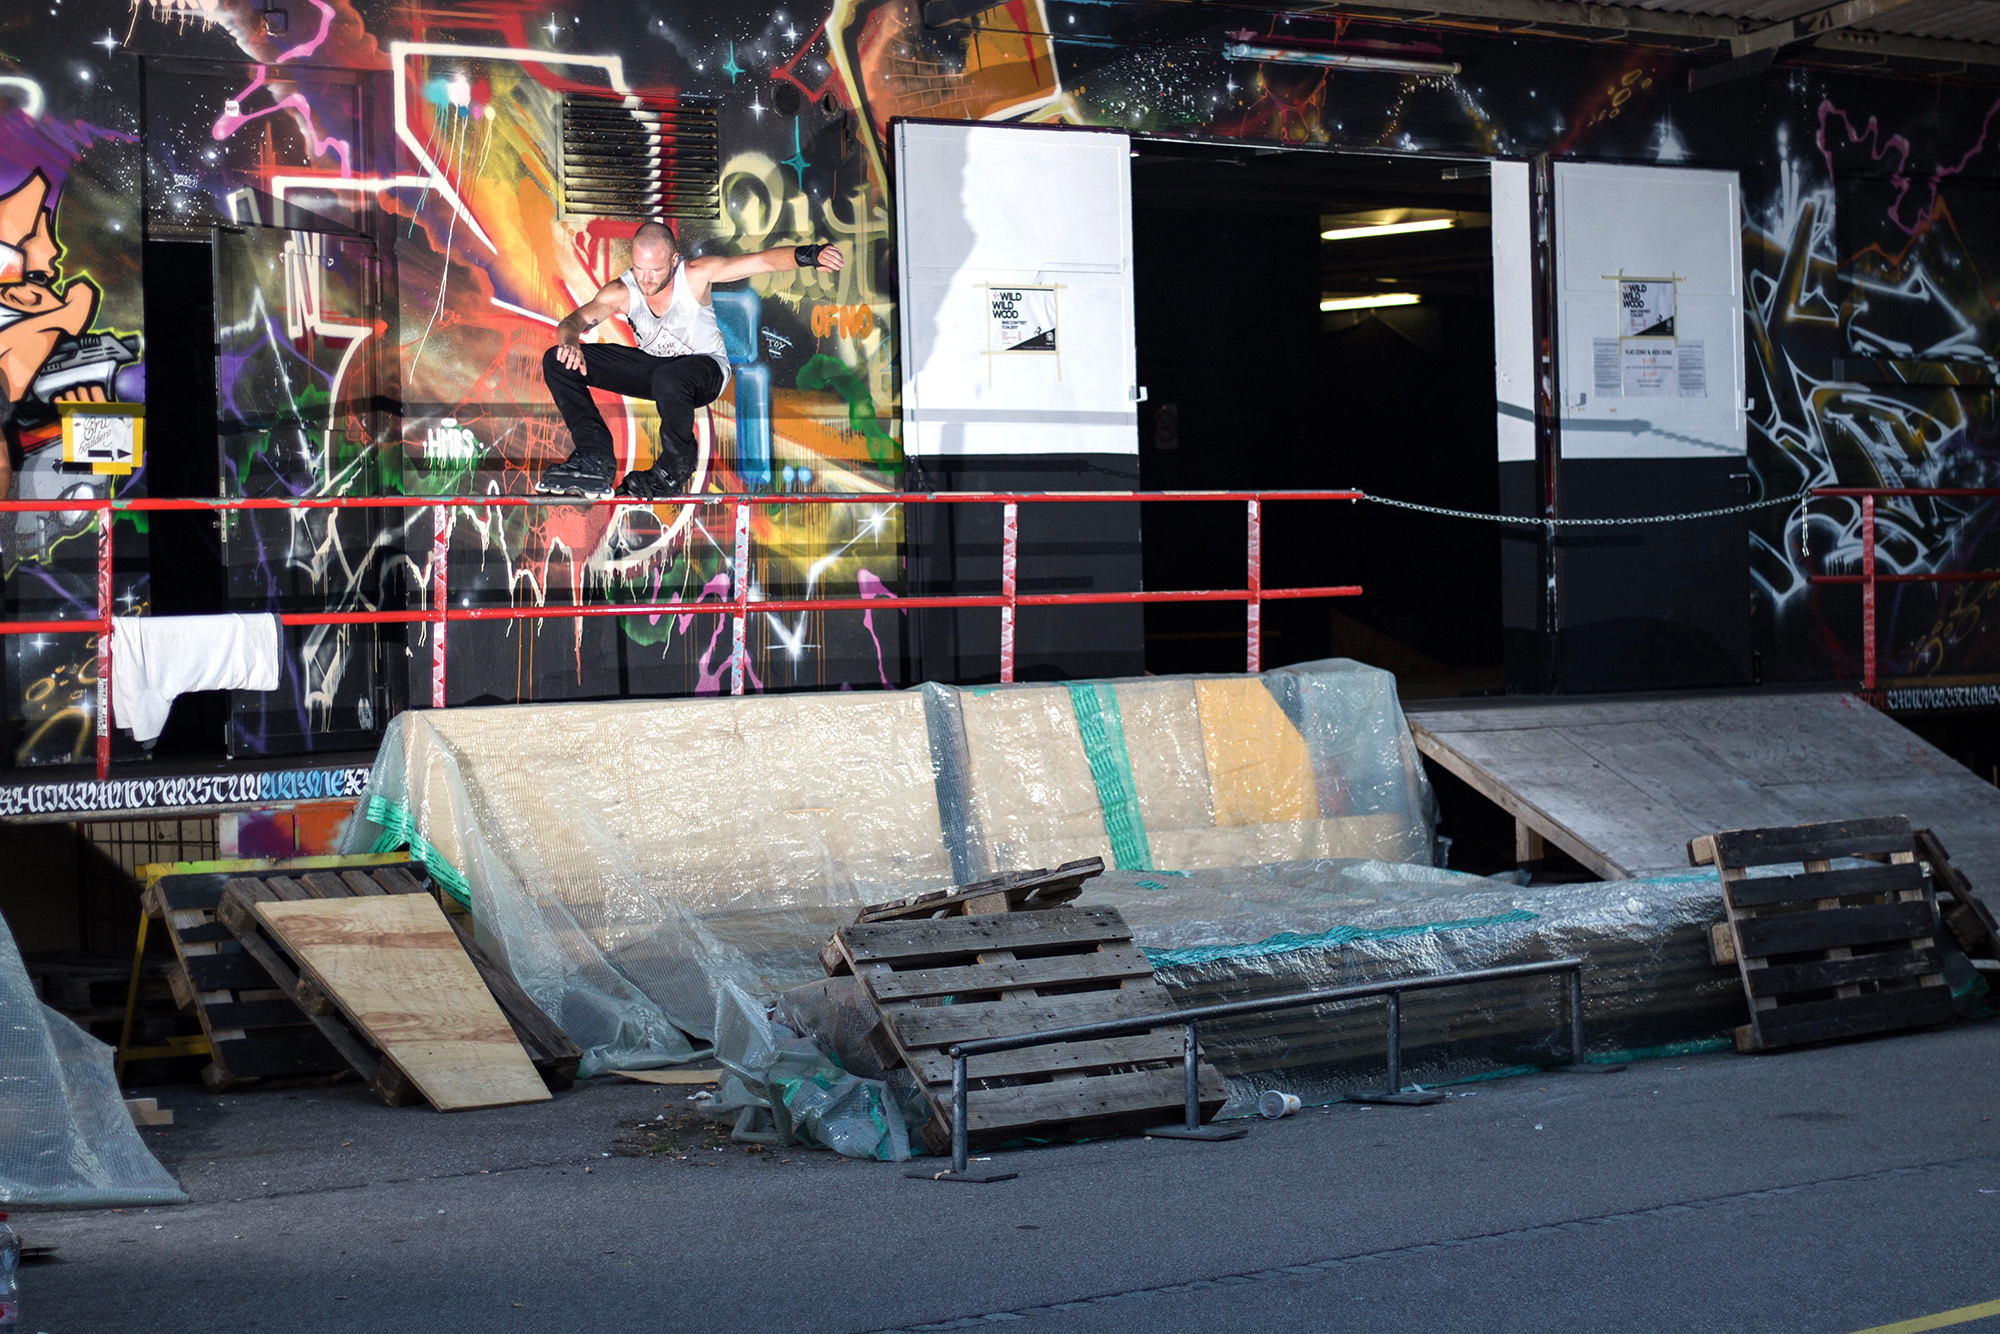 adrian top acid - Skateboard Deckbank